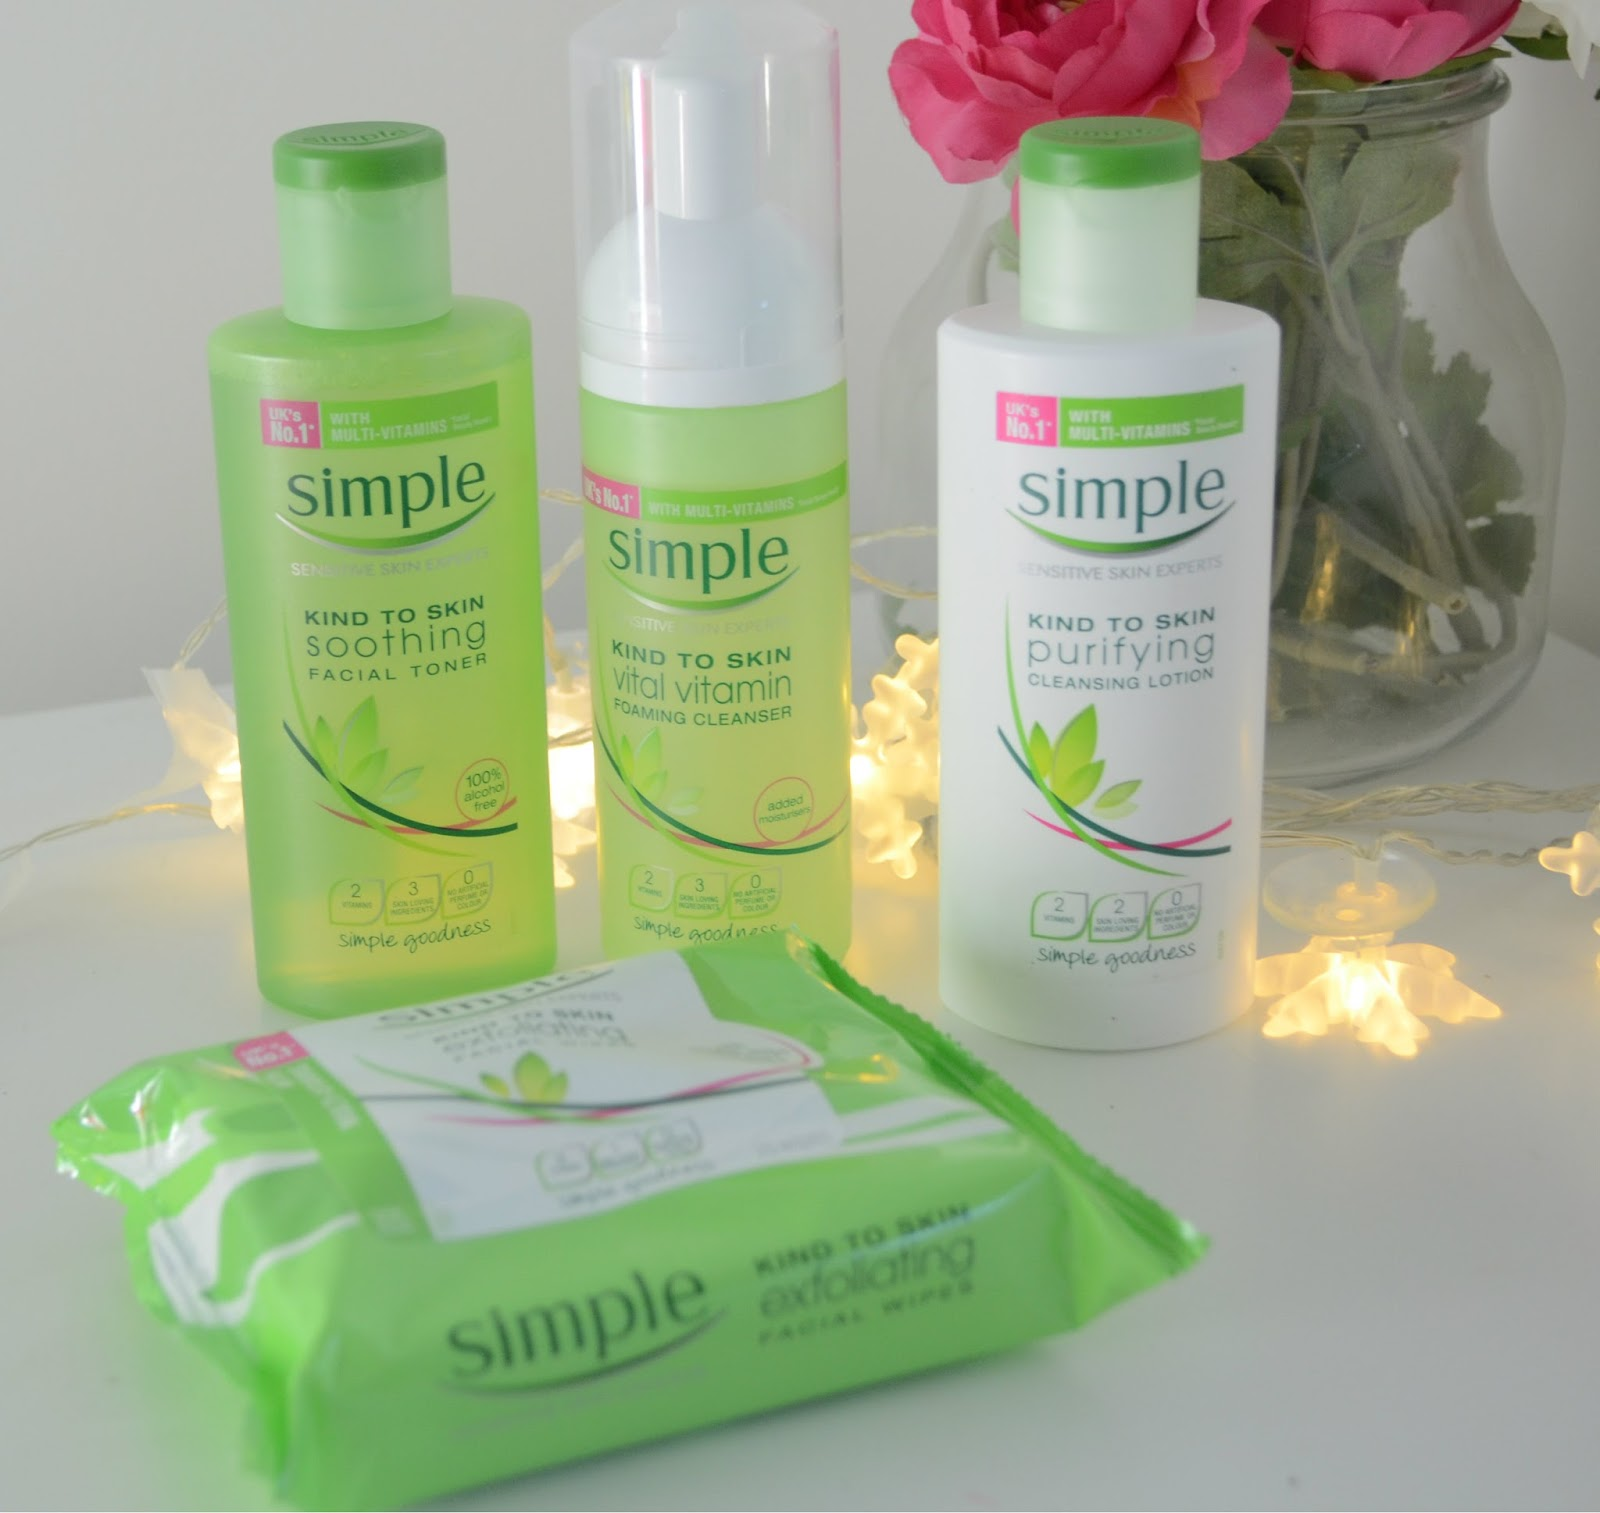 Simple Products simple skincare simple sense dizzybrunette